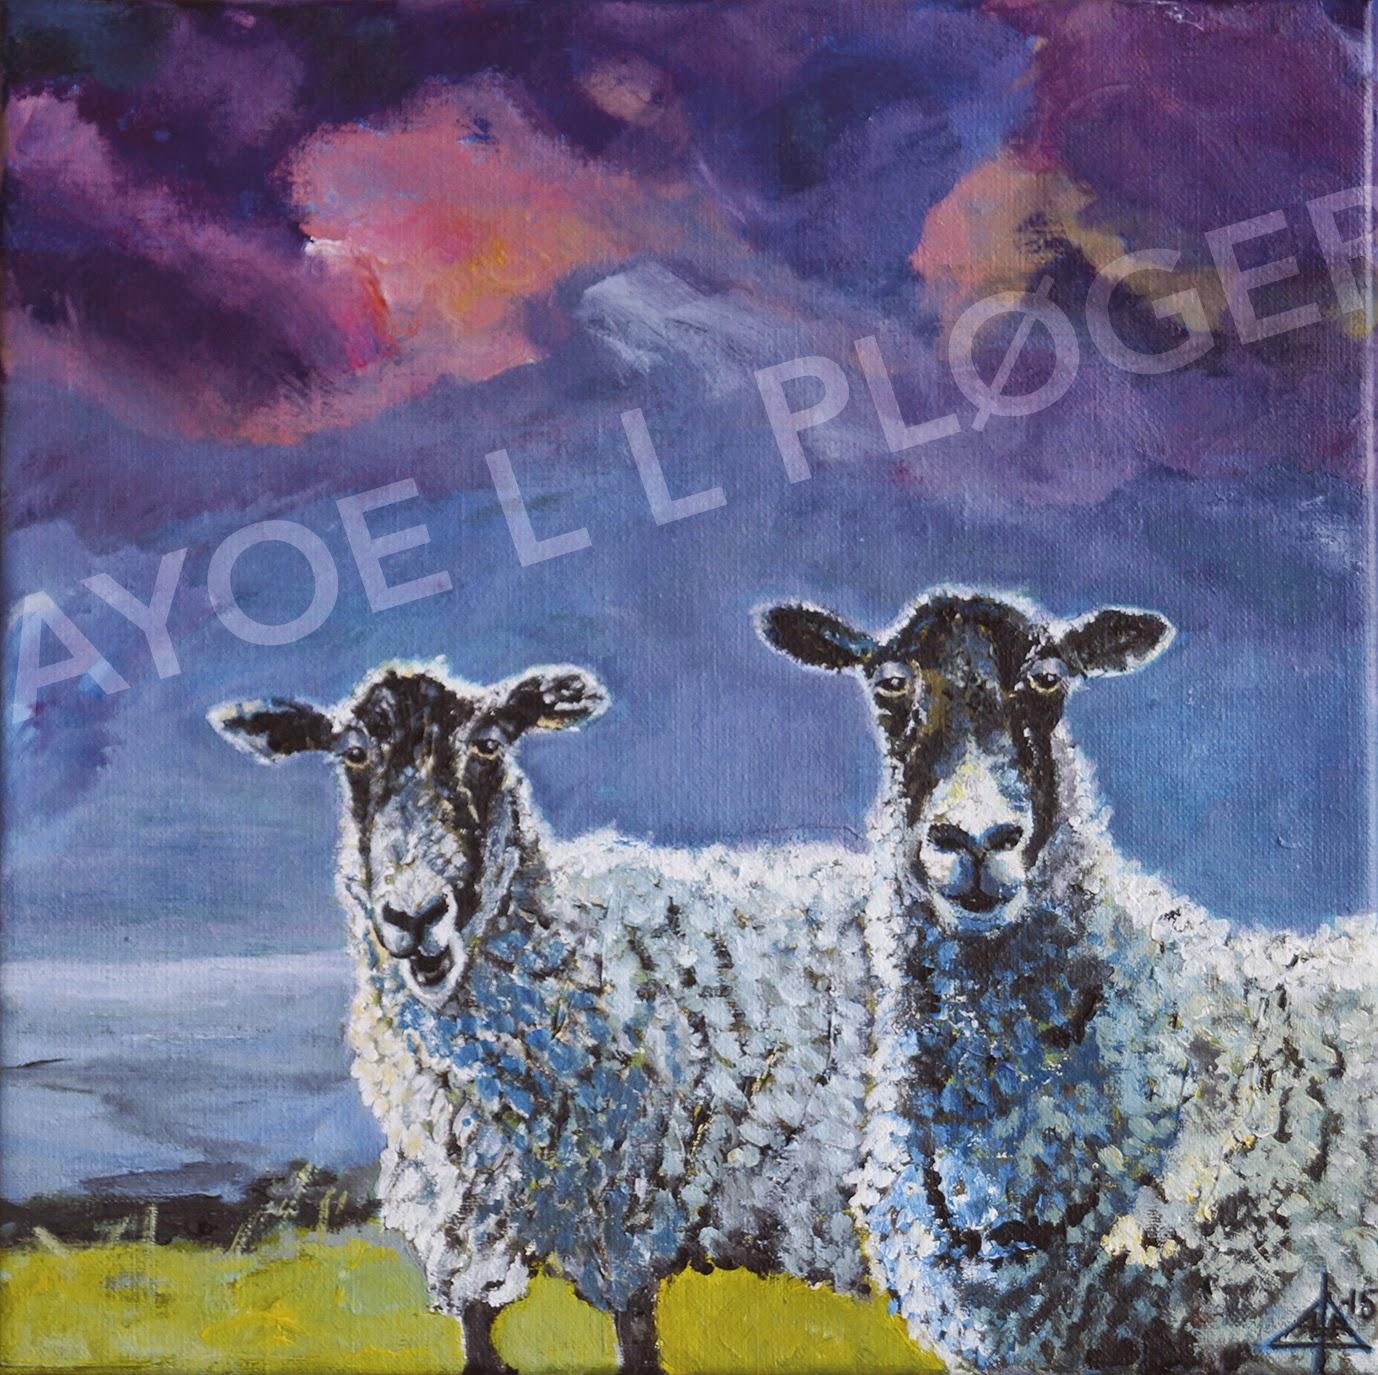 Får, lam, marsken, venskab, maleri, acryl, kunst, sheep, friendship, dige